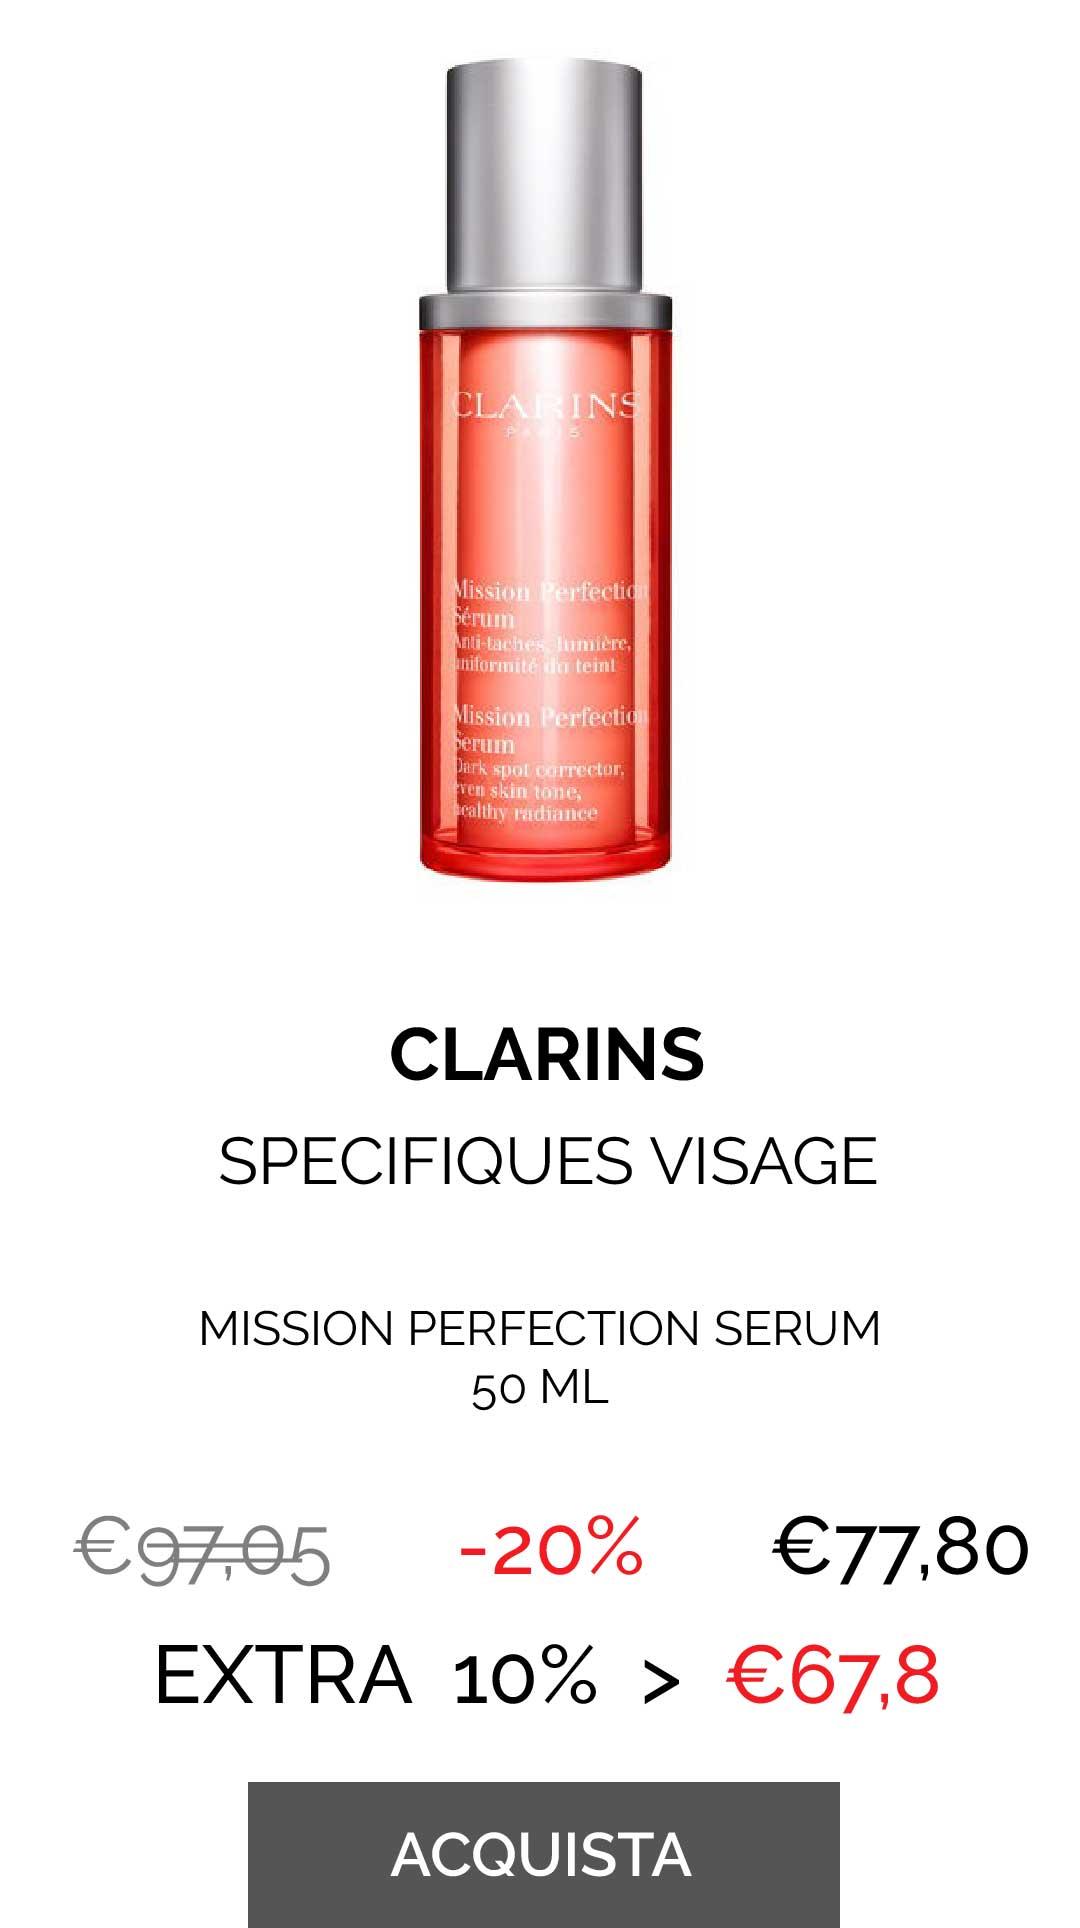 CLARINS - MISSION PERFECTION SERUM 50 ML